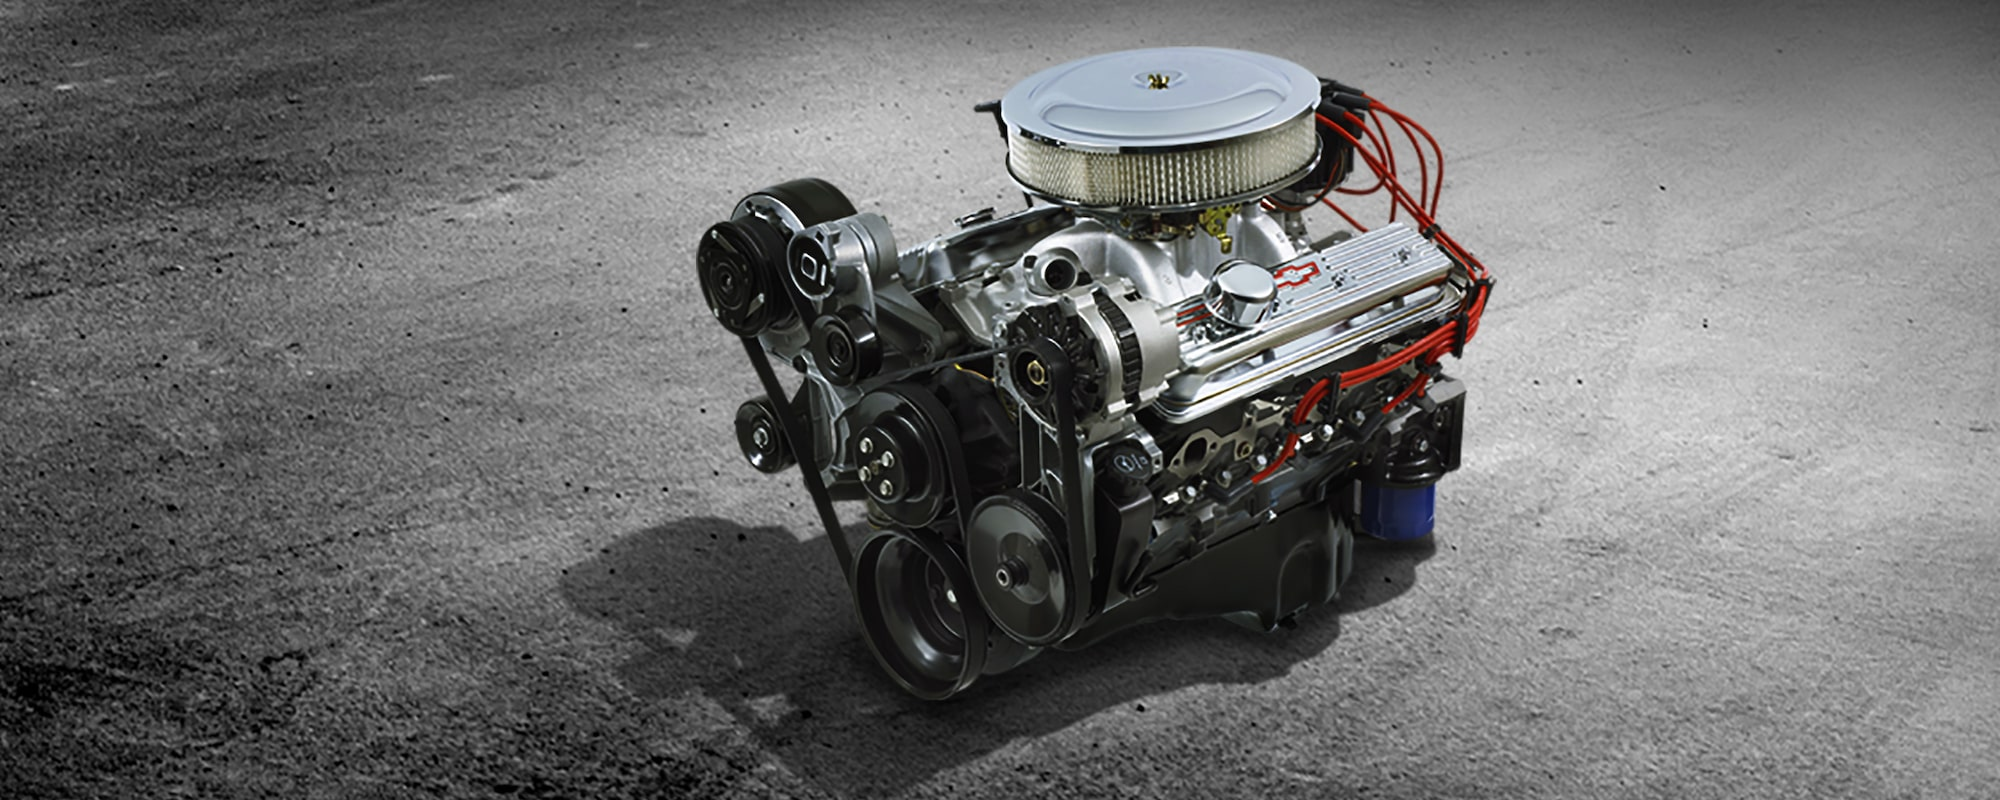 hight resolution of drag racing engine diagram wiring diagram featured drag racing engine diagram